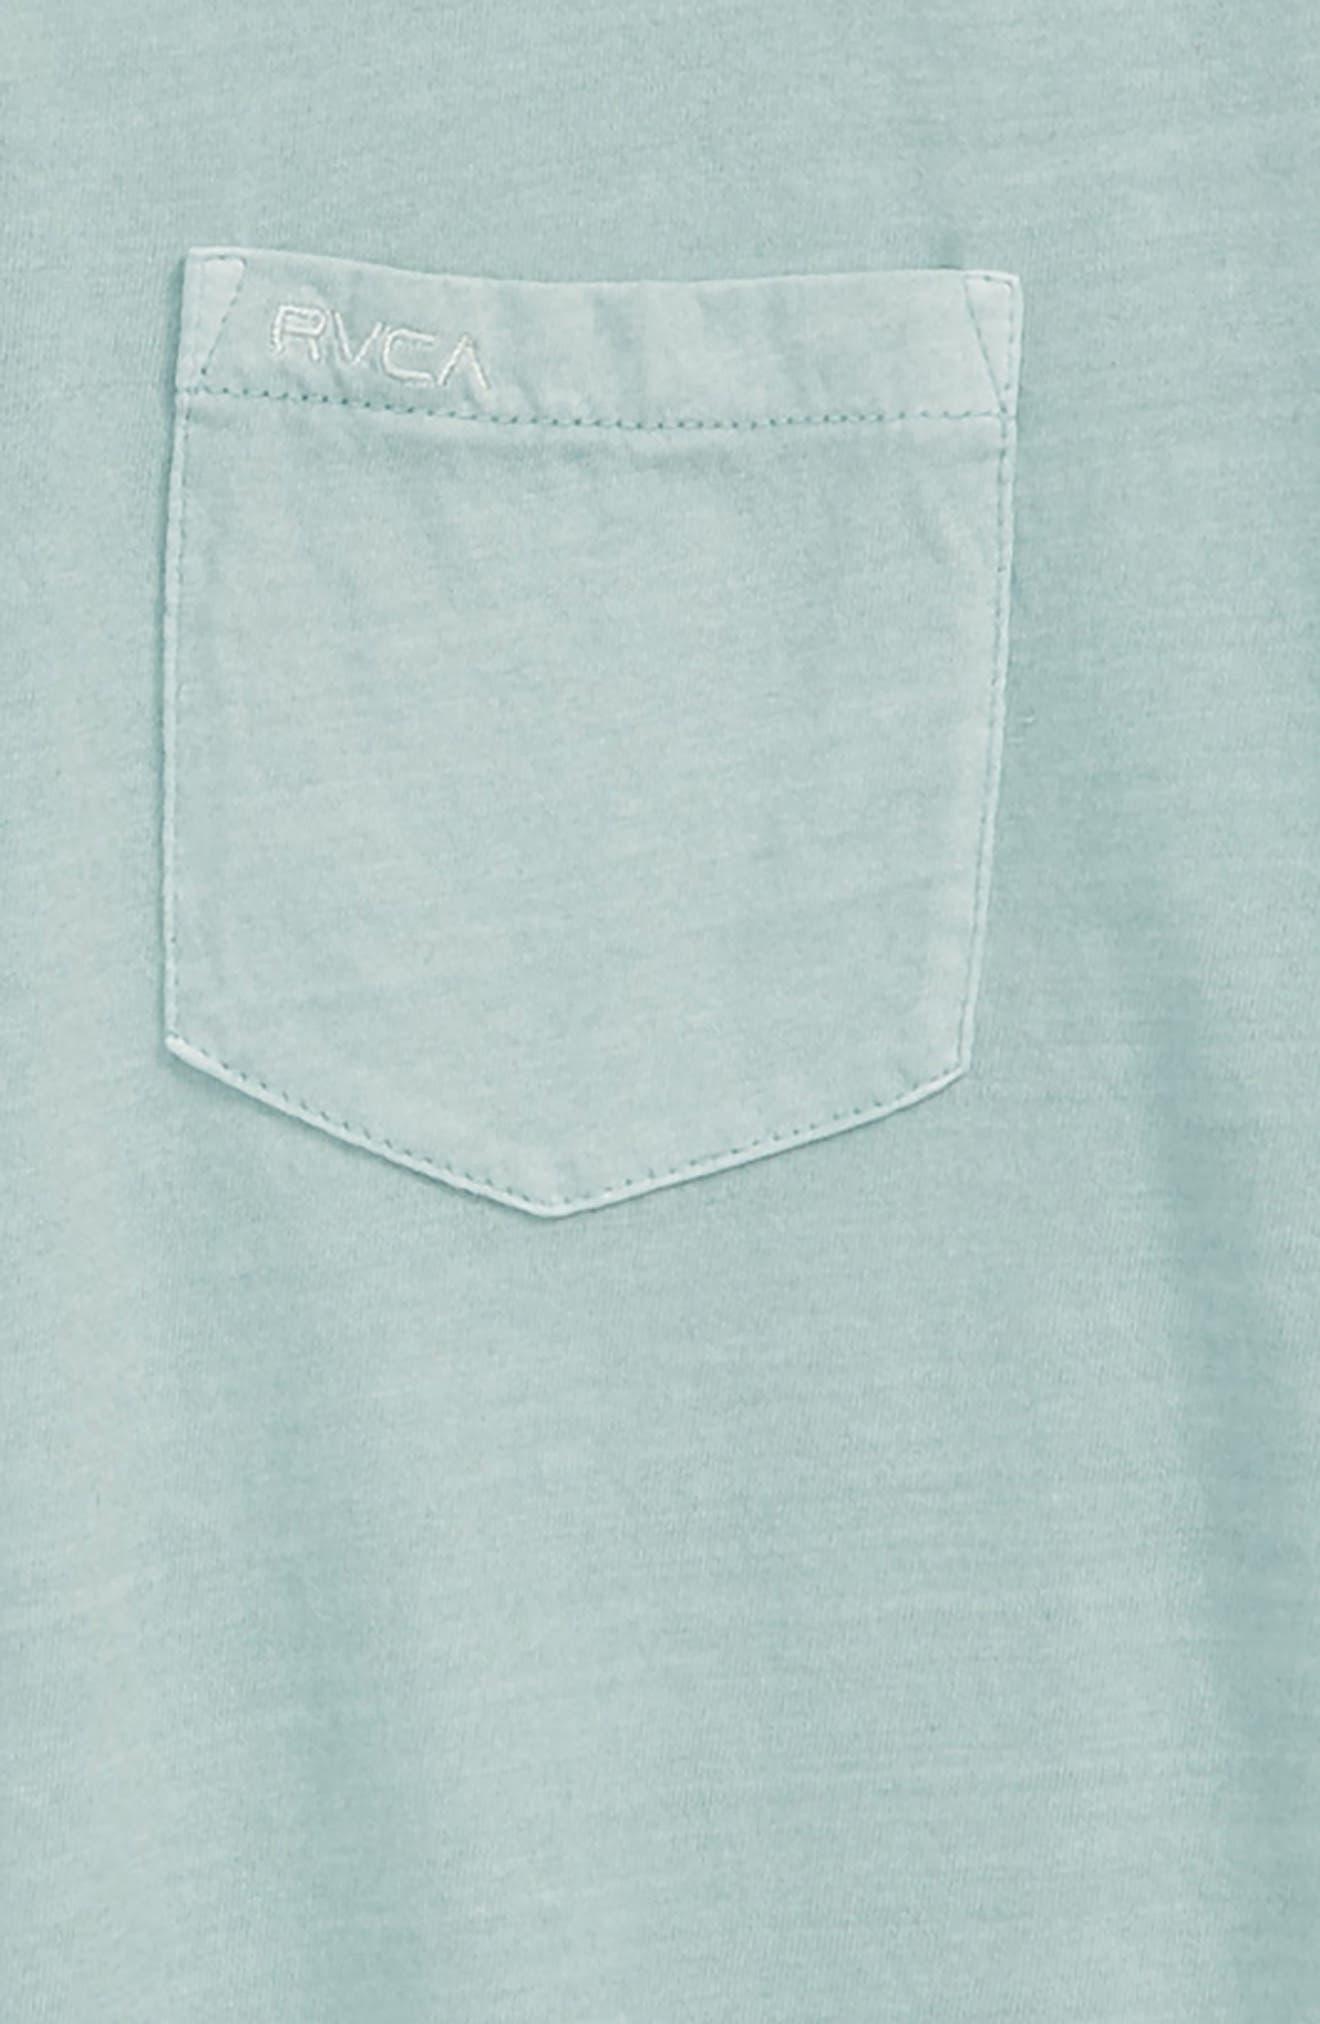 Pigment Polo,                             Alternate thumbnail 2, color,                             Grey Mist